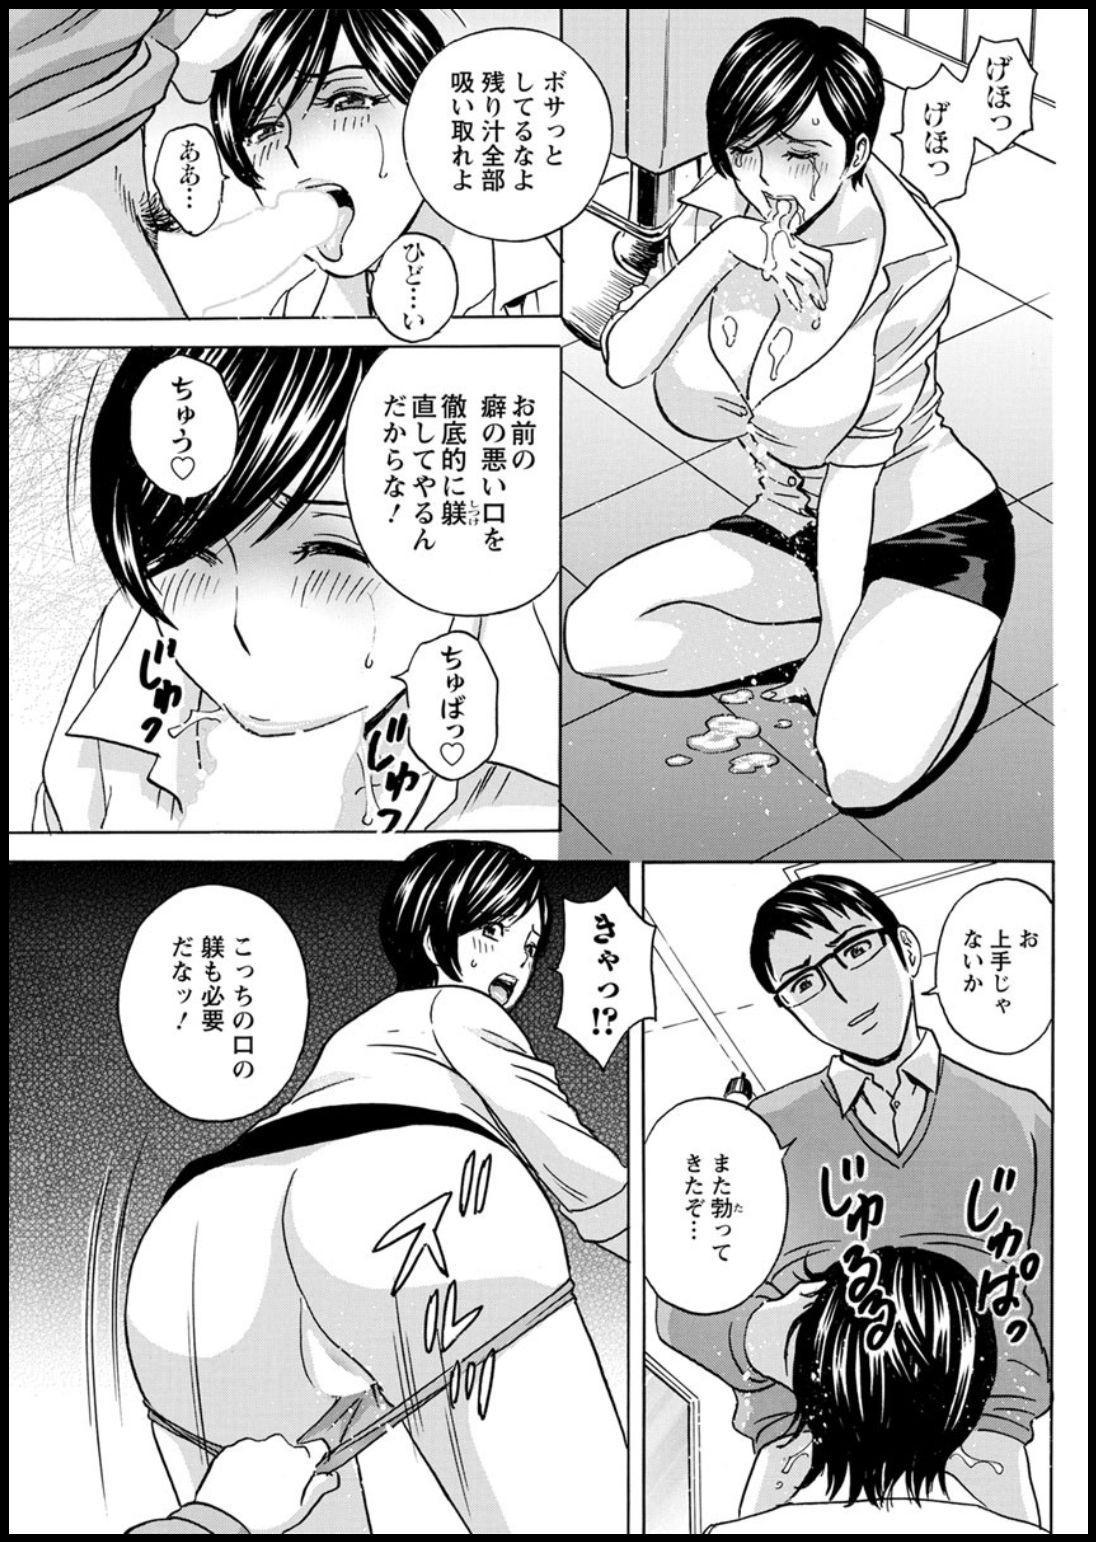 [Hidemaru] Yurase Bikyonyuu! Hataraku J-Cup Ch. 1-5 [Digital] 86